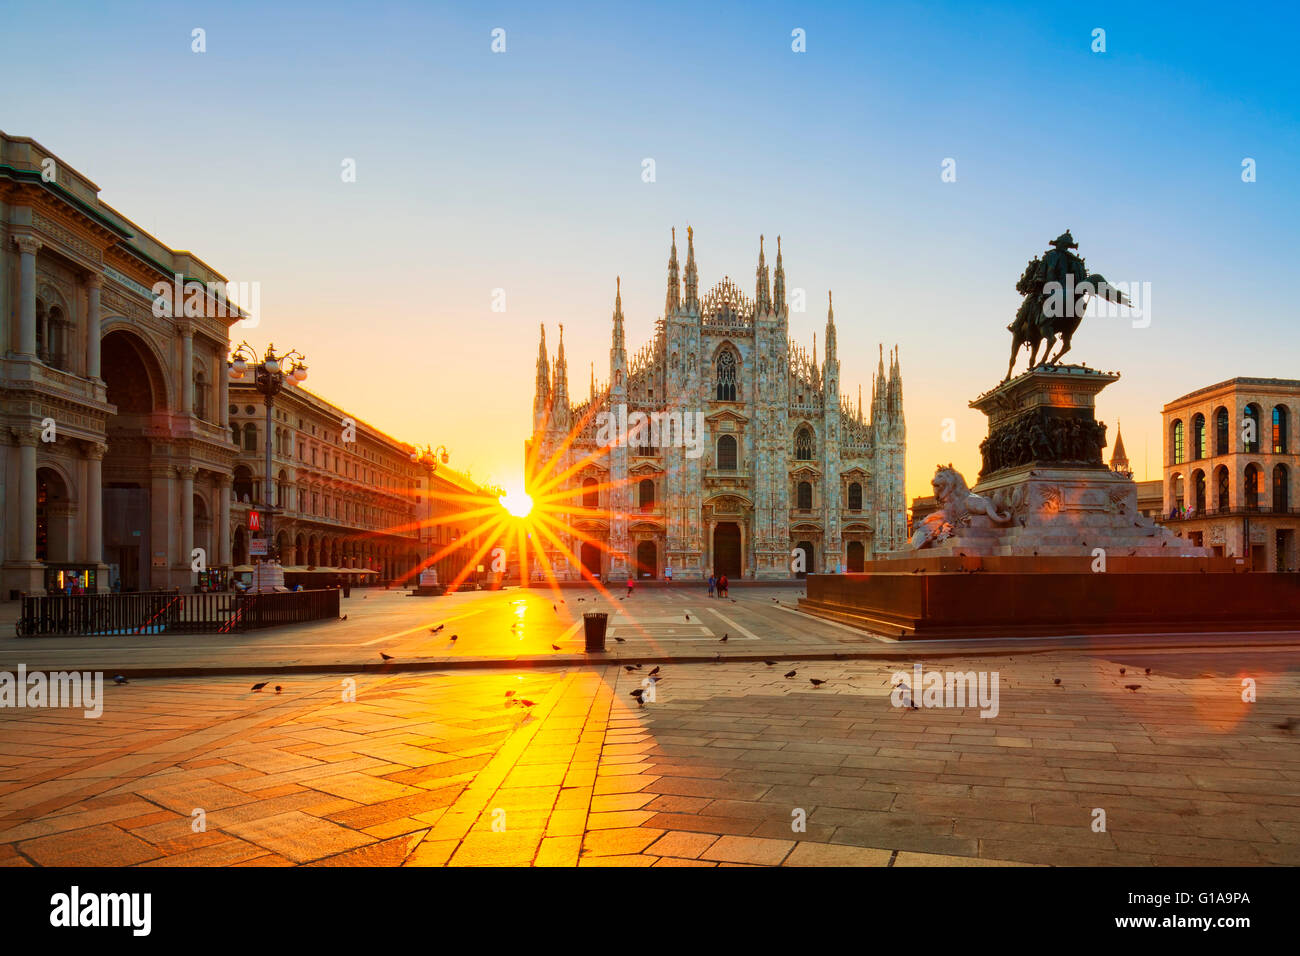 View of Duomo at sunrise, Milan, Italy. - Stock Image